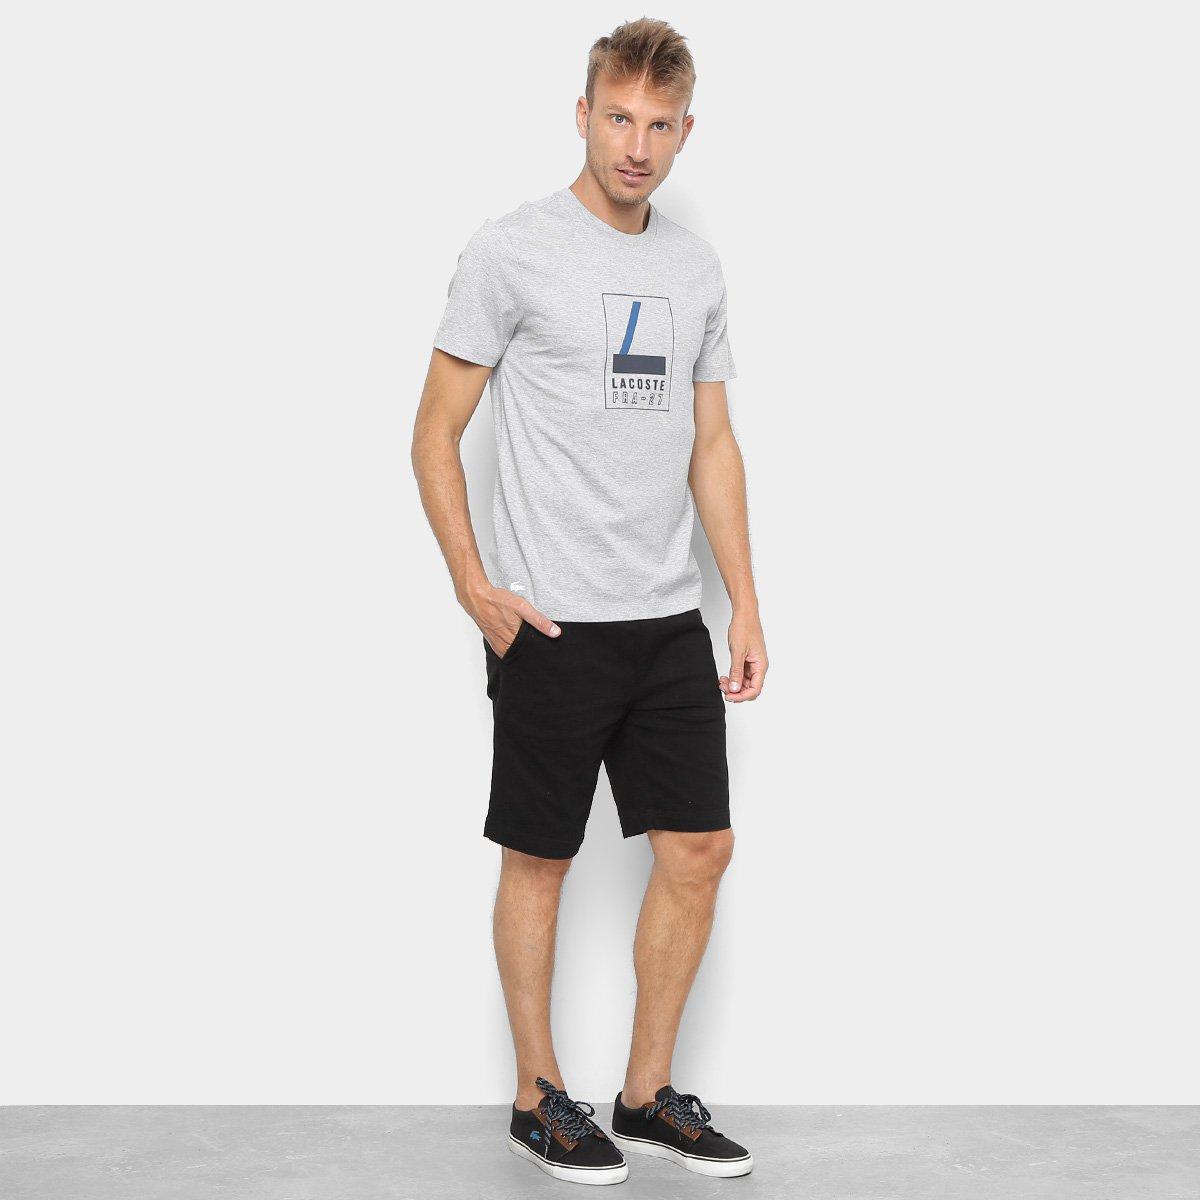 74fc1f77d8c Camiseta Lacoste Estampada Masculina - Cinza Claro - Compre Agora ...